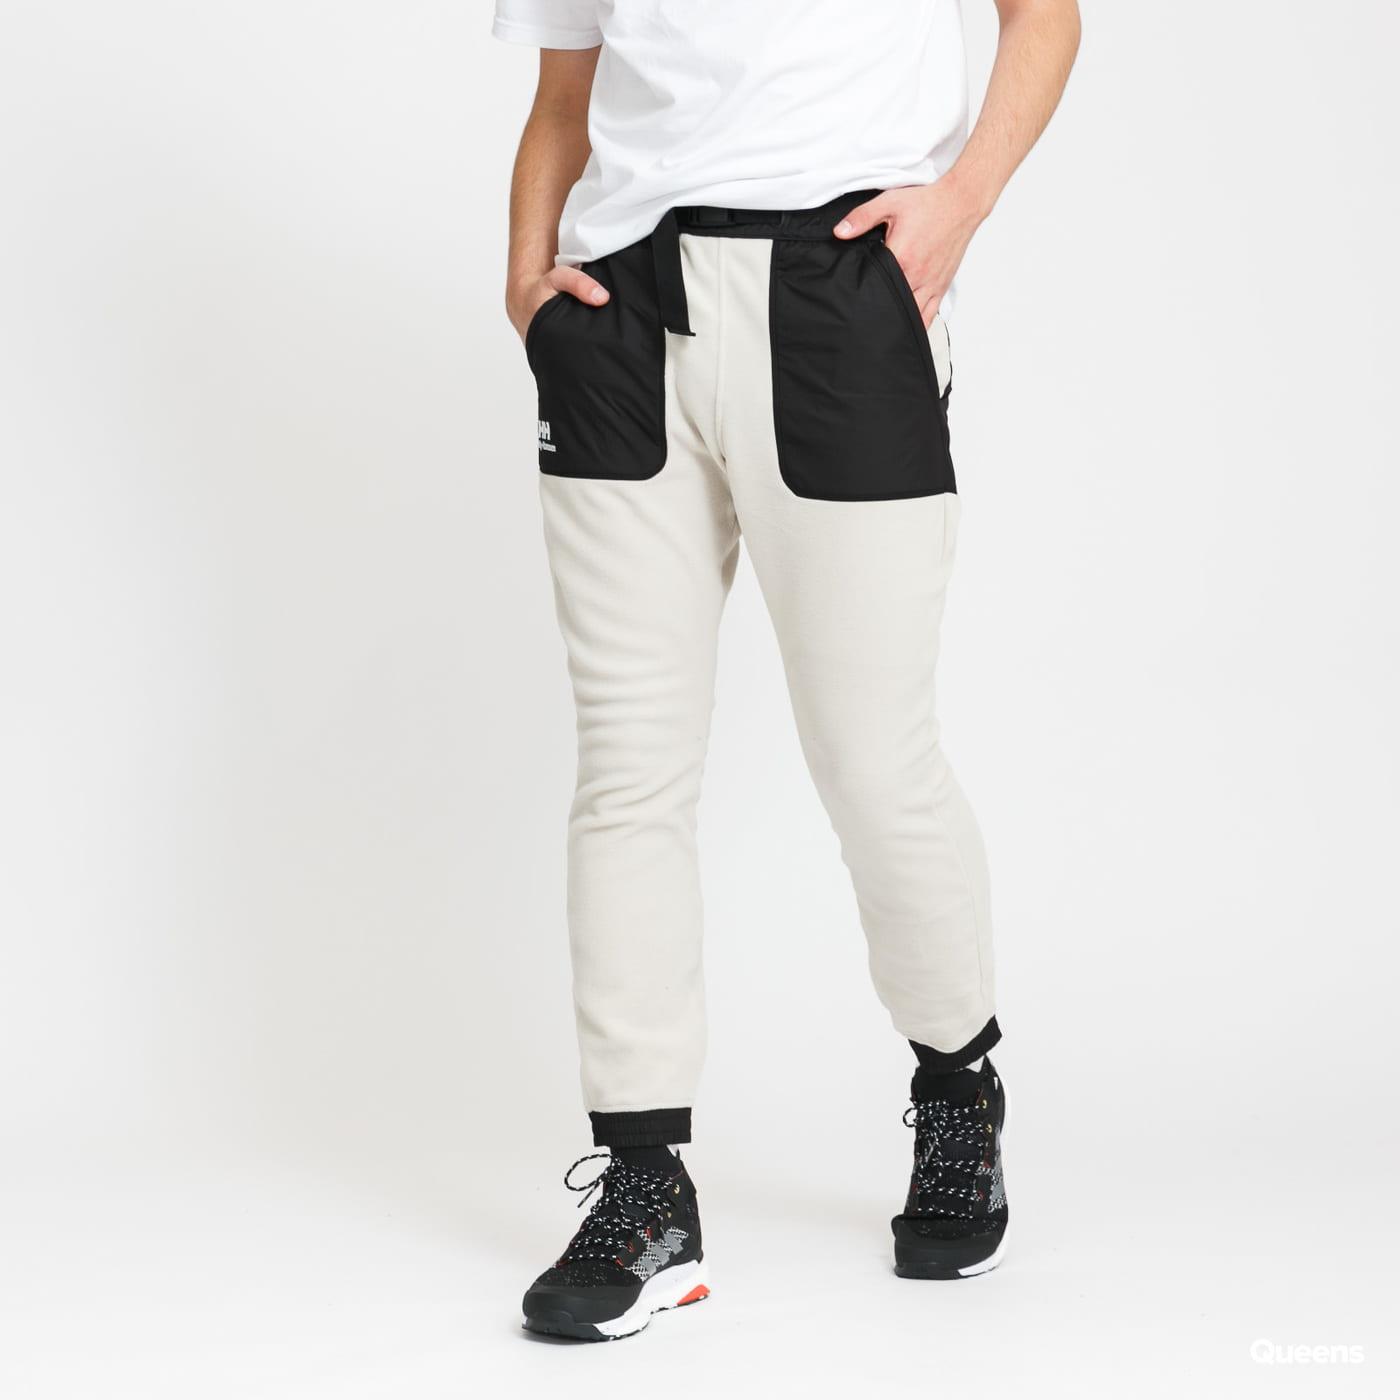 Helly Hansen YU Fleece Pant cream / black